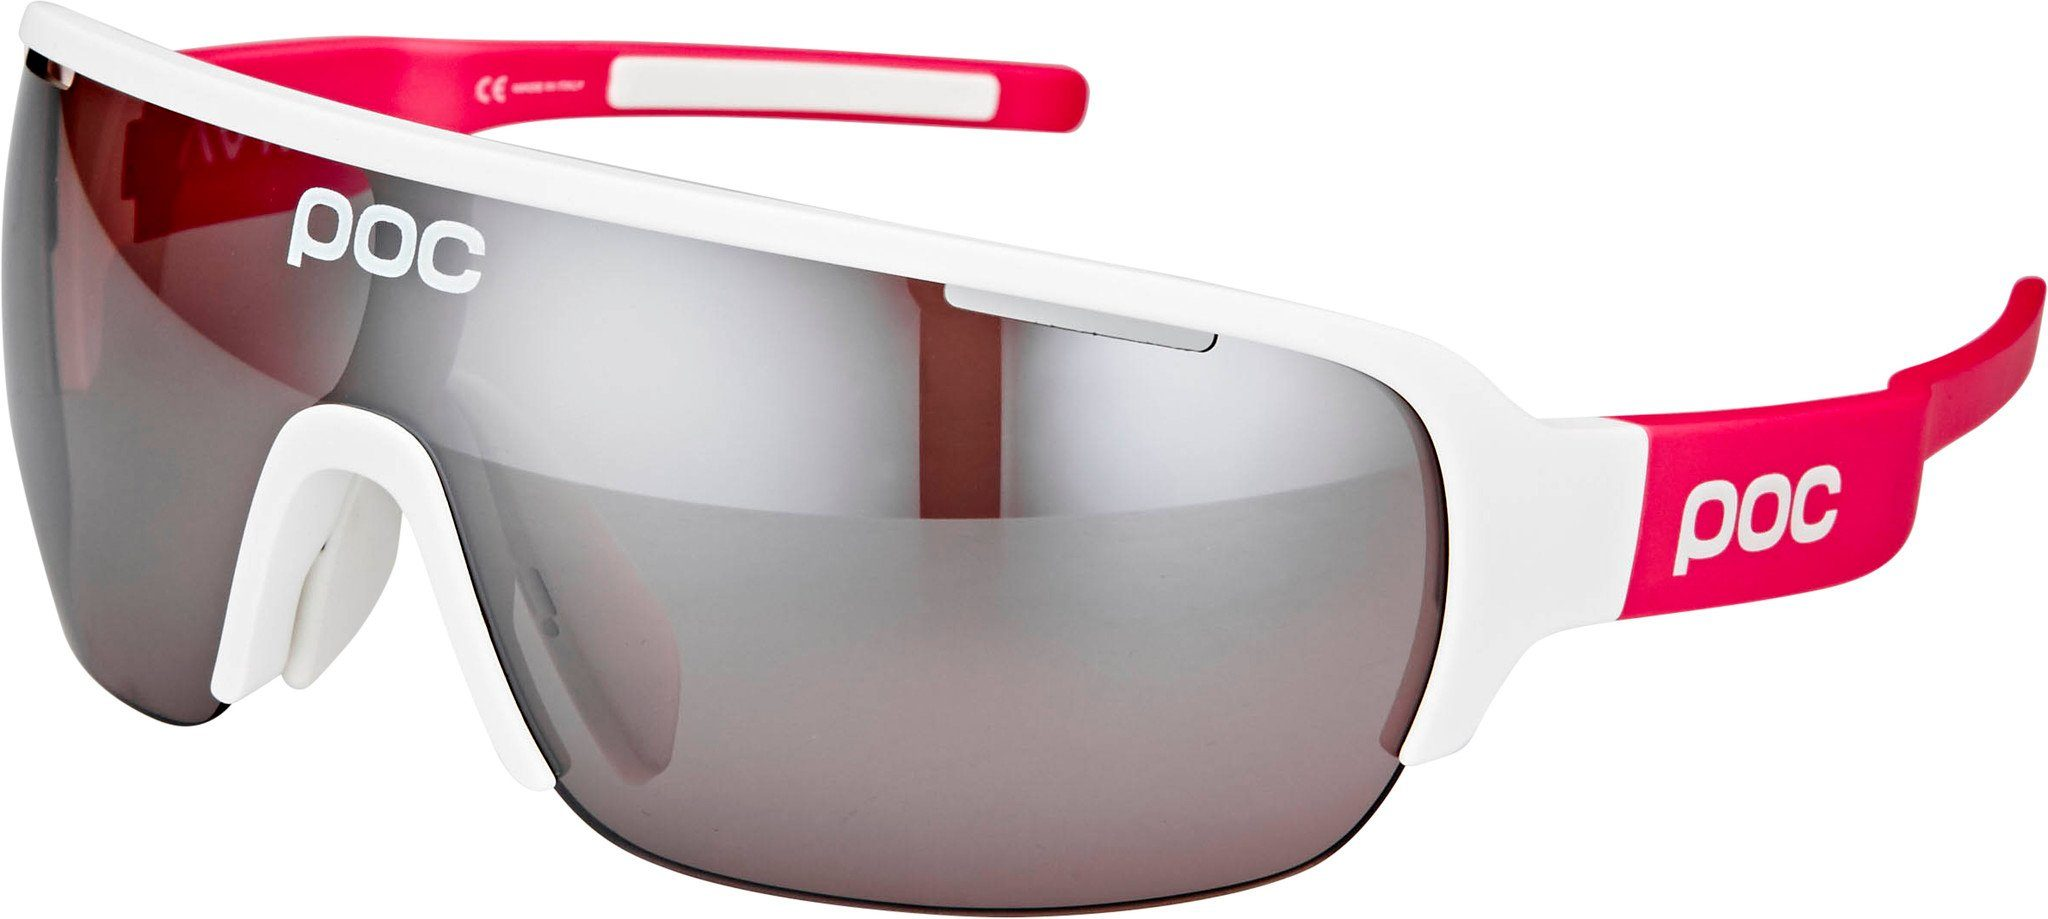 POC Sportbrille »DO Half Blade AVIP Glasses«